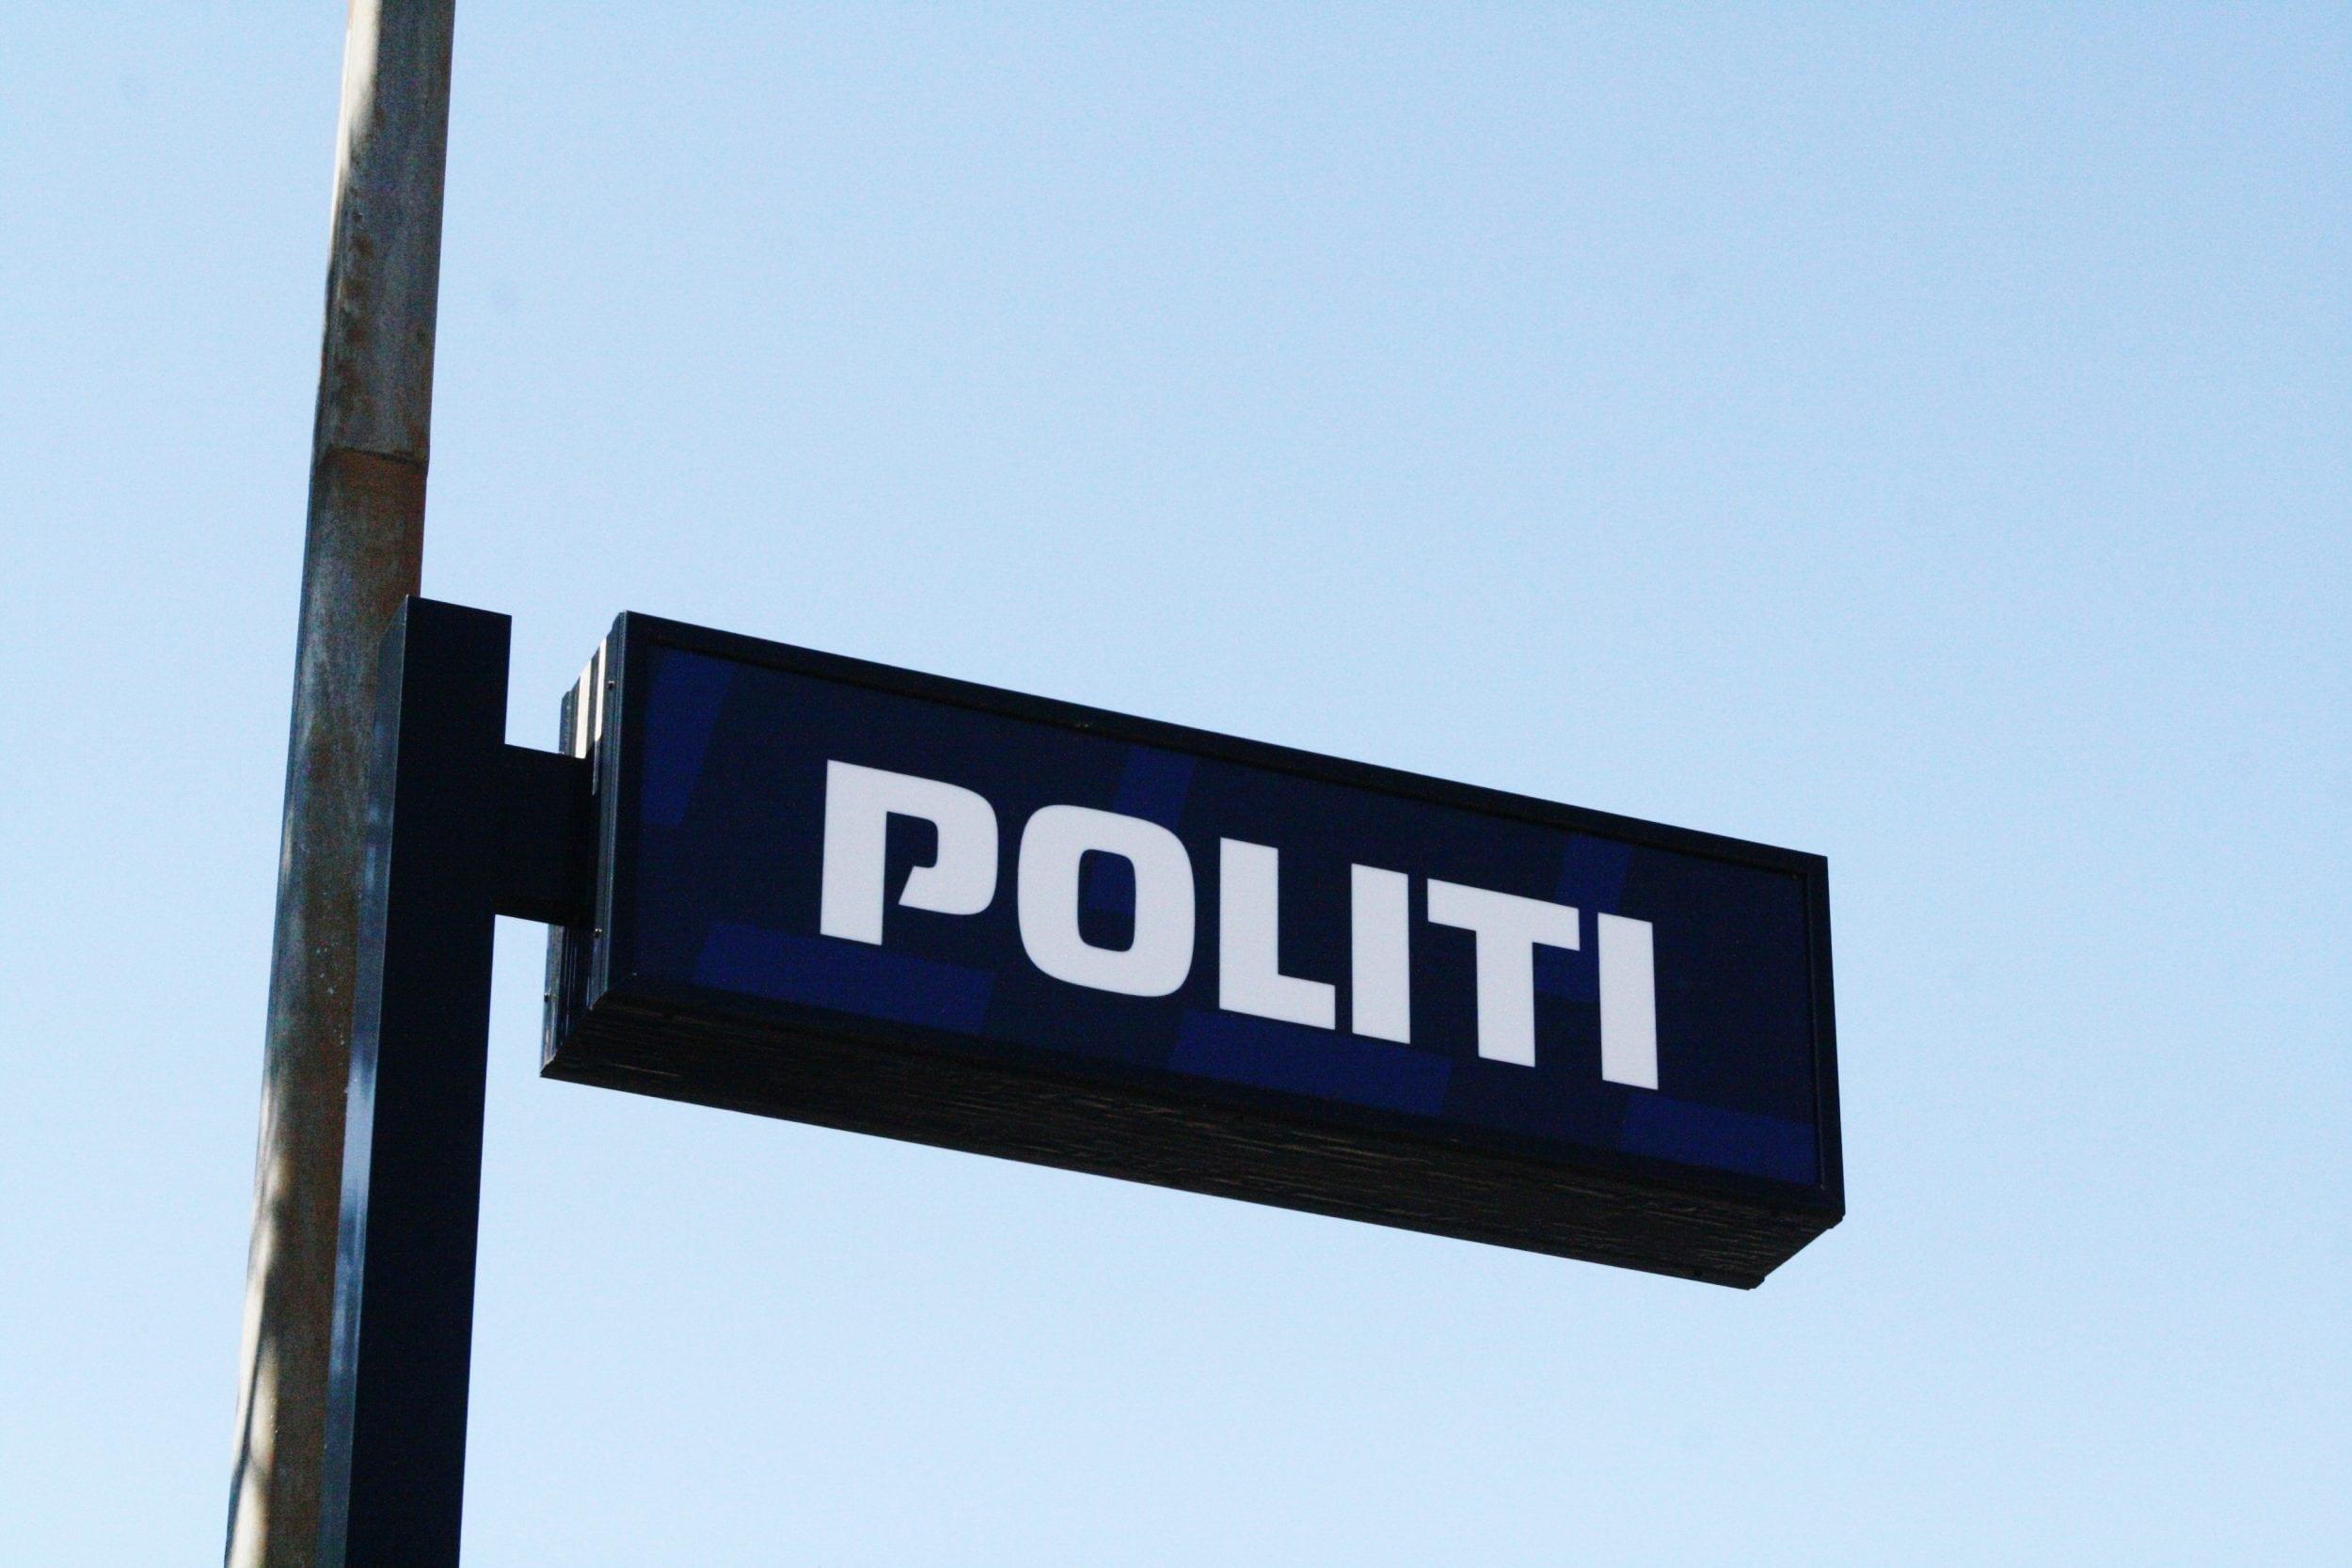 Politirapporten for Gentofte Kommune i tidsrummet 2020-01-21 til 2020-01-13